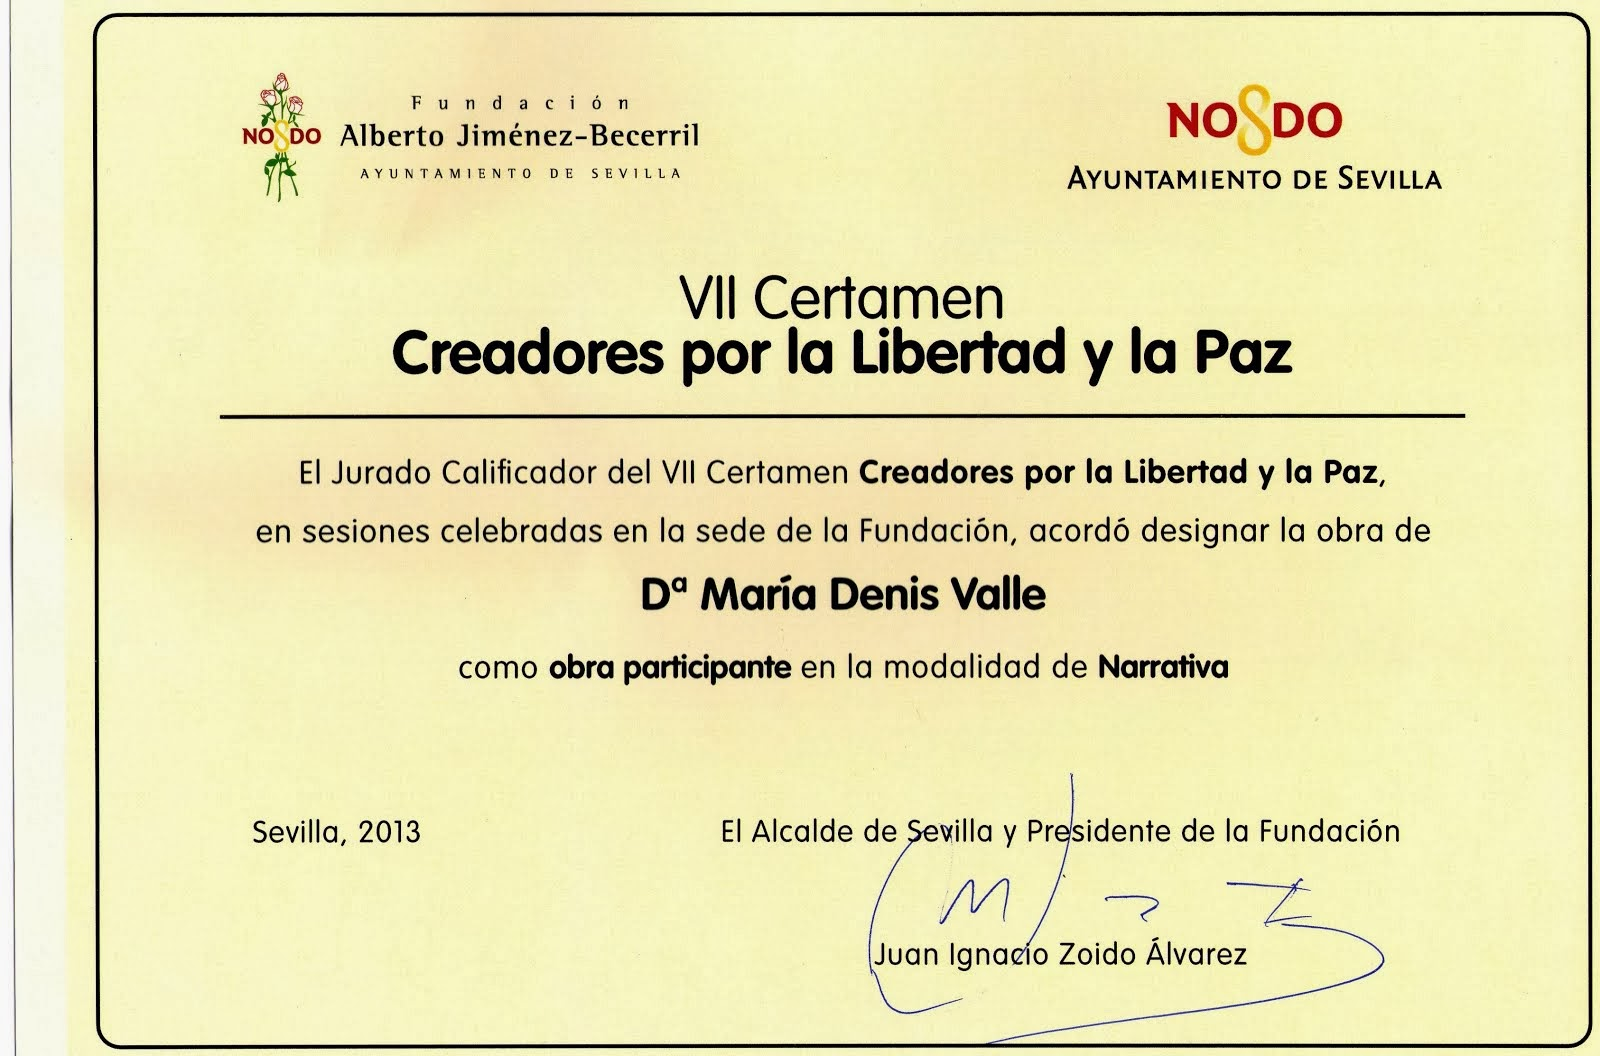 Por la Libertad y la Paz